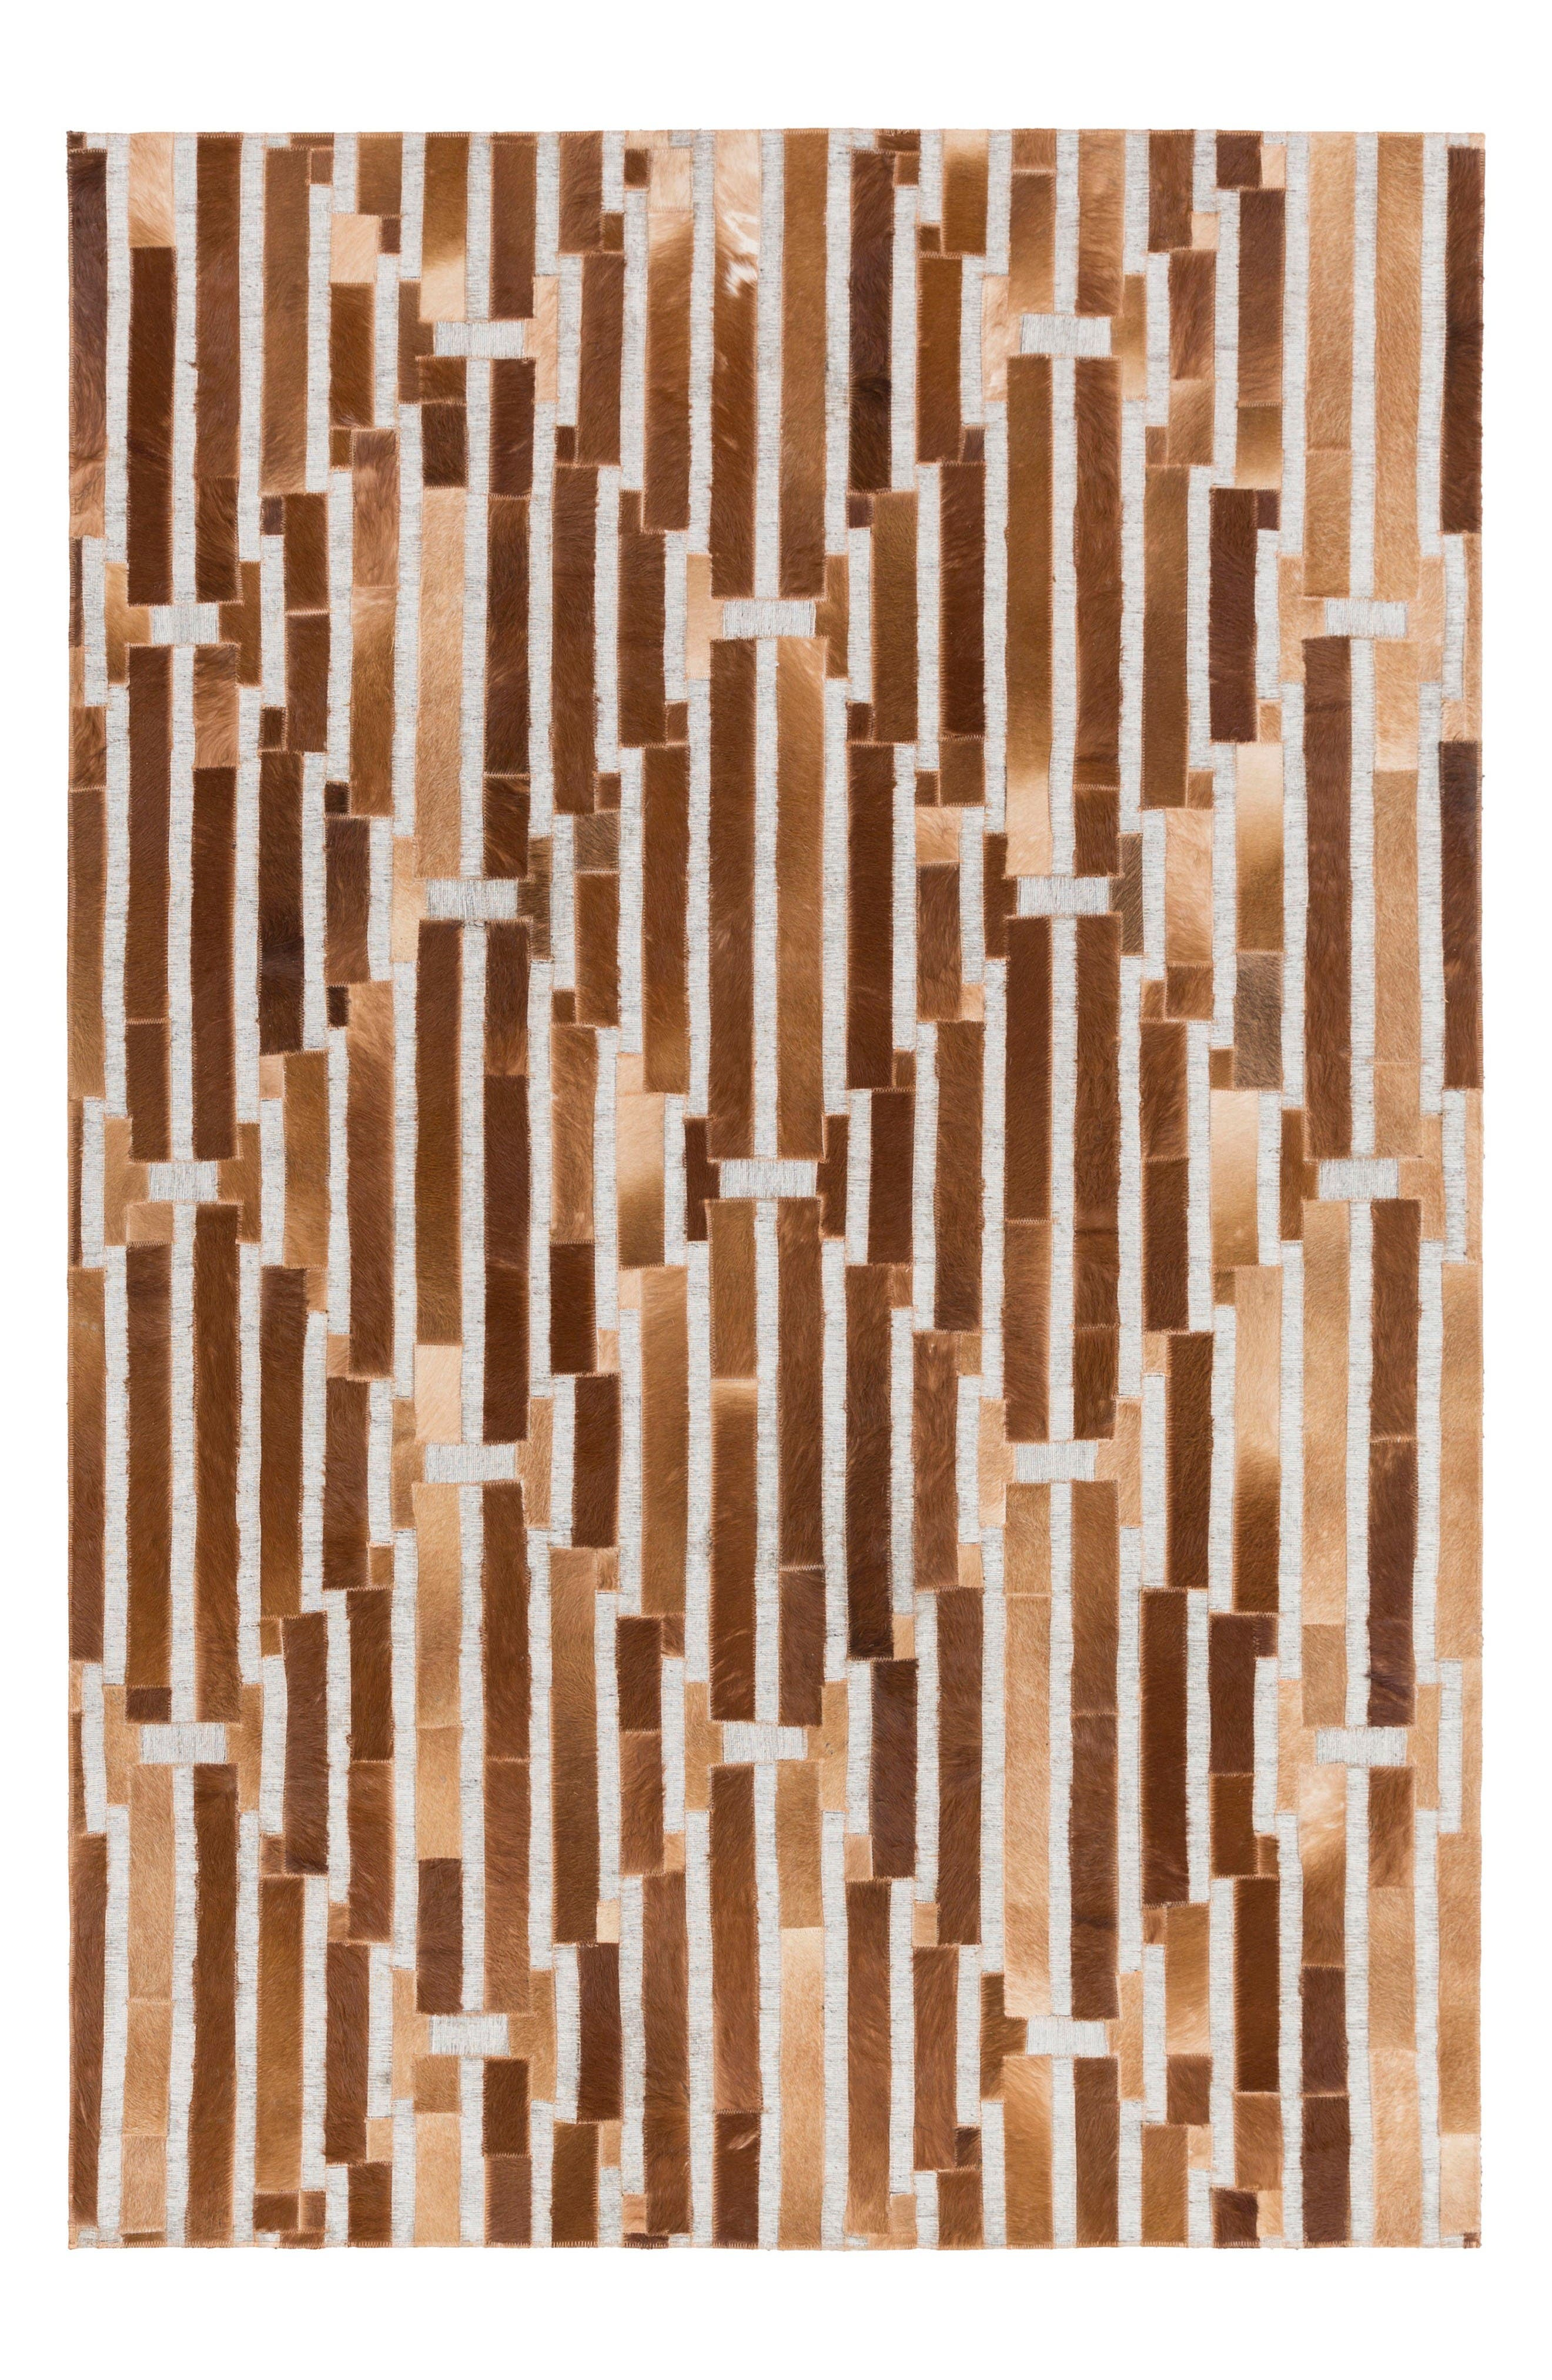 Medora Irregular Hand Stitched Rug,                             Main thumbnail 1, color,                             Brown